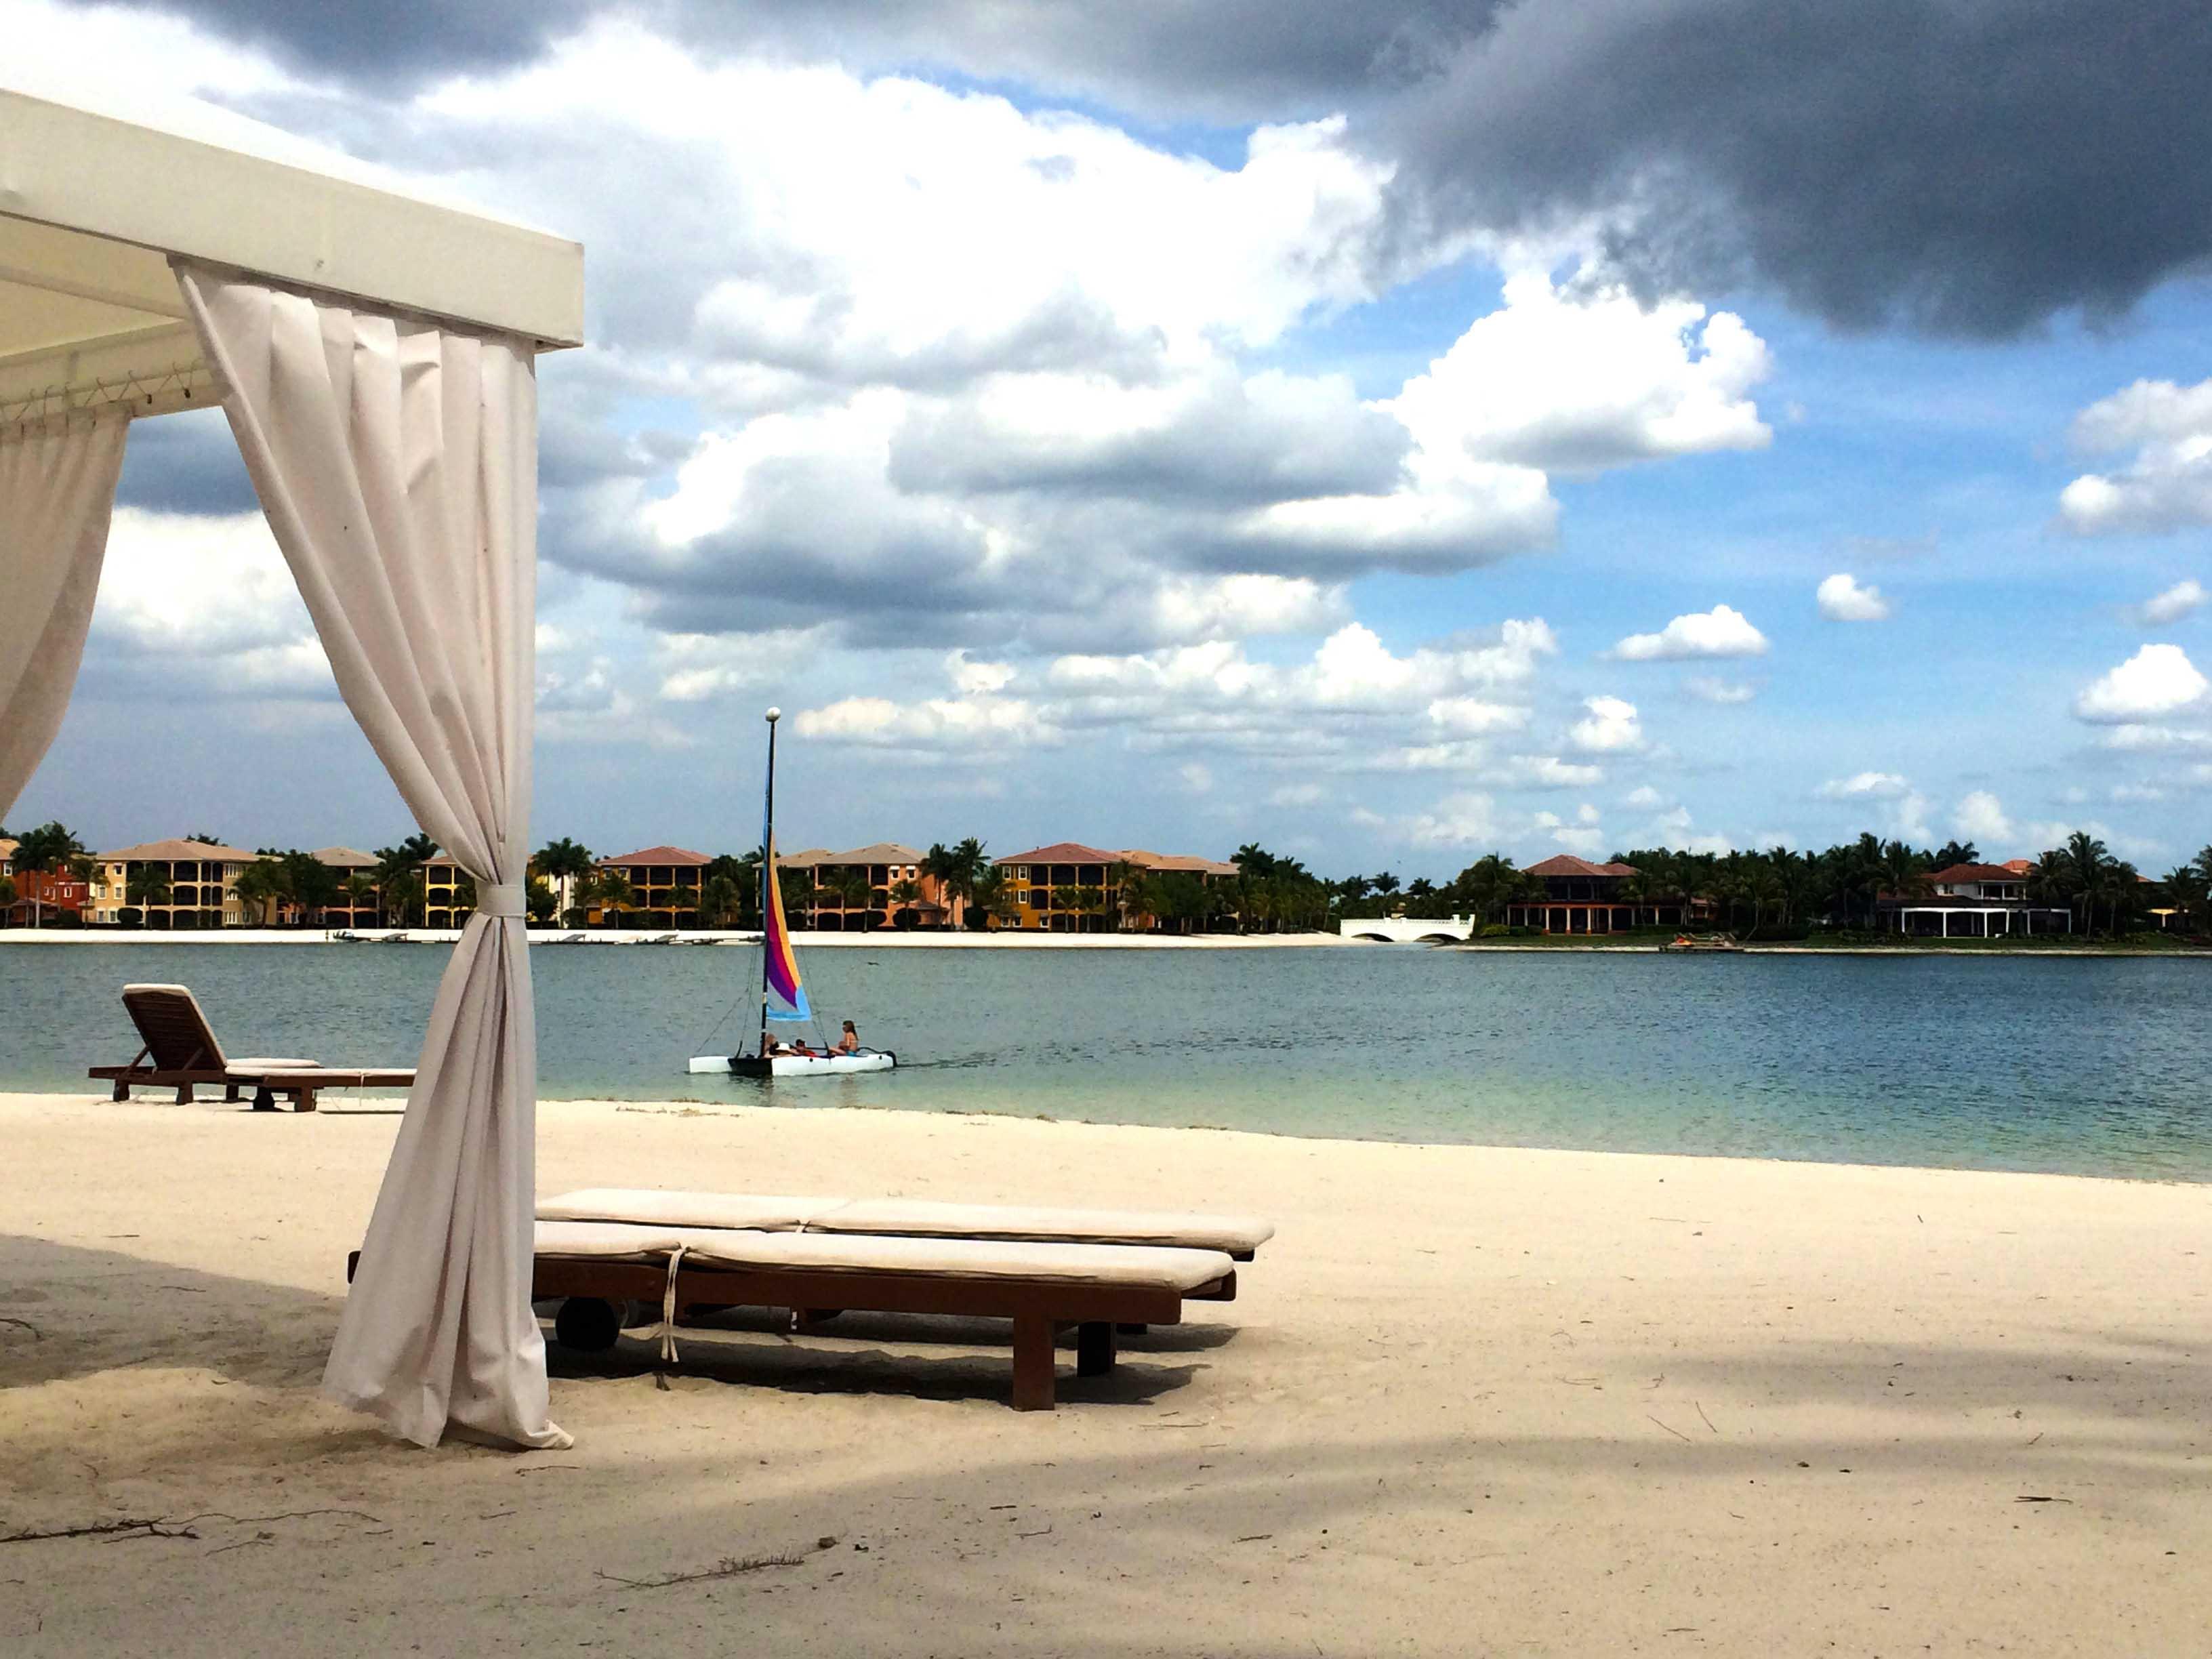 fort-myers-amenities-miromar-beach-cabana.jpg